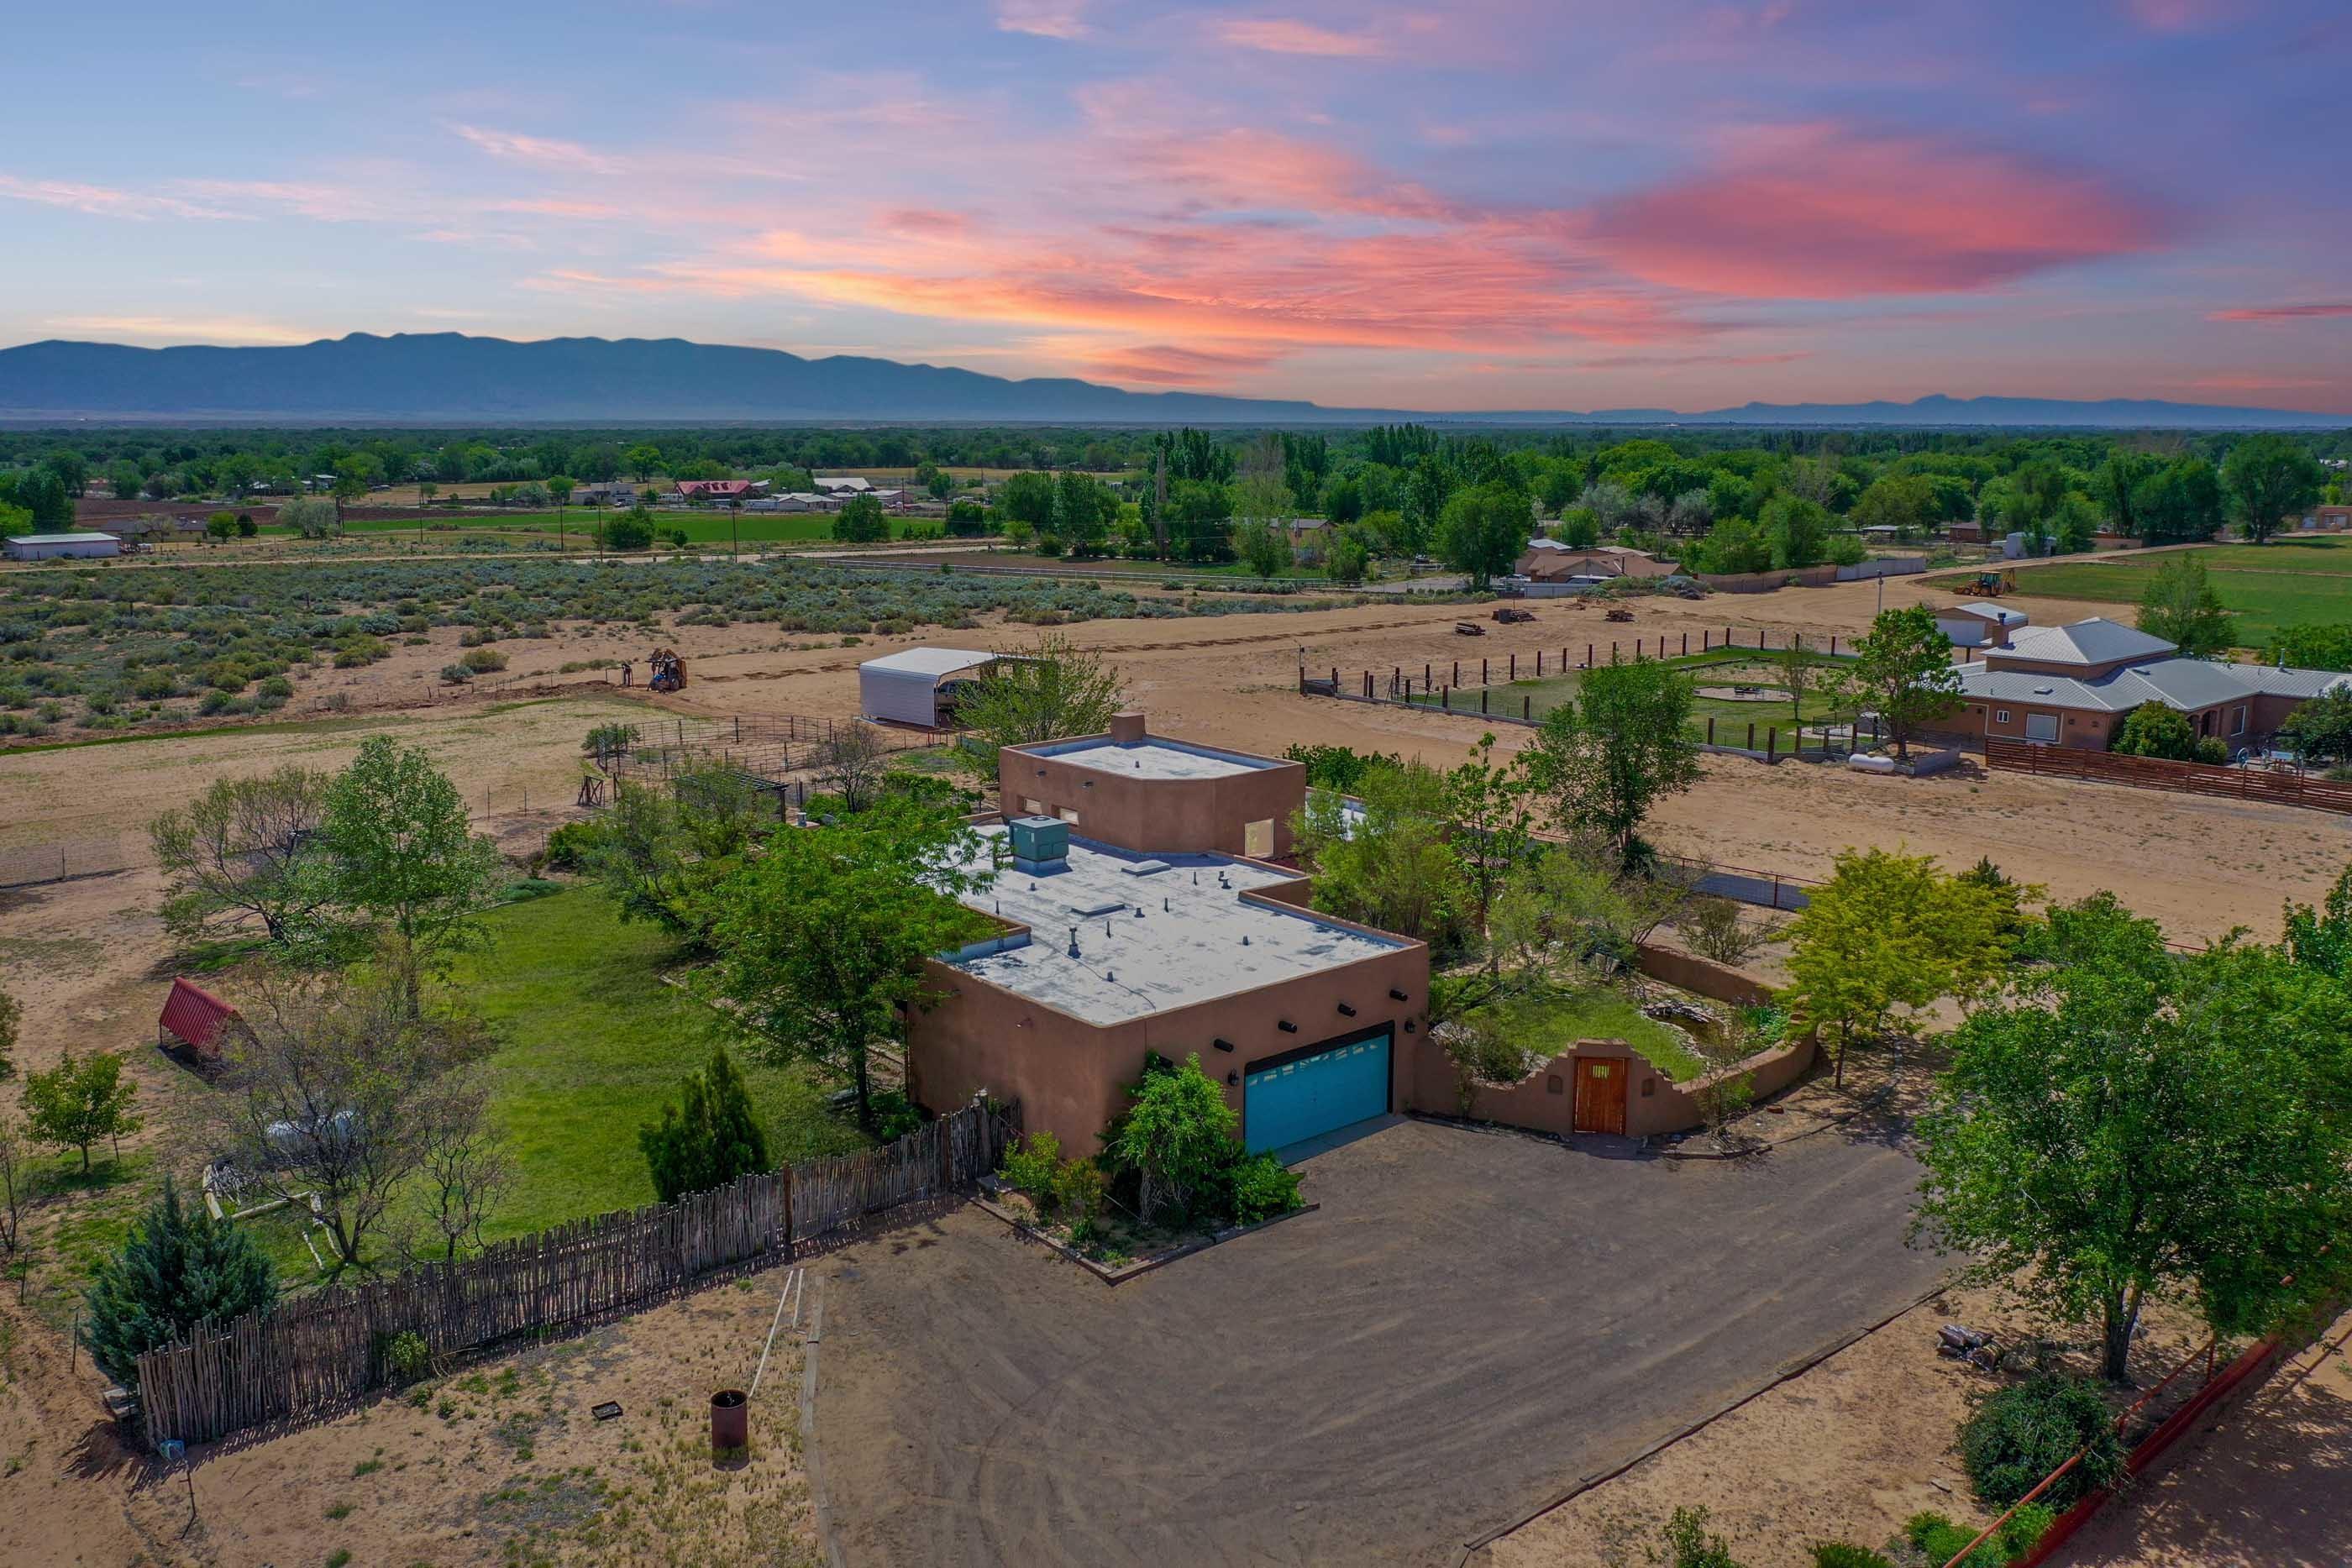 28 Cielo Vista, Belen, NM 87002 - Belen, NM real estate listing